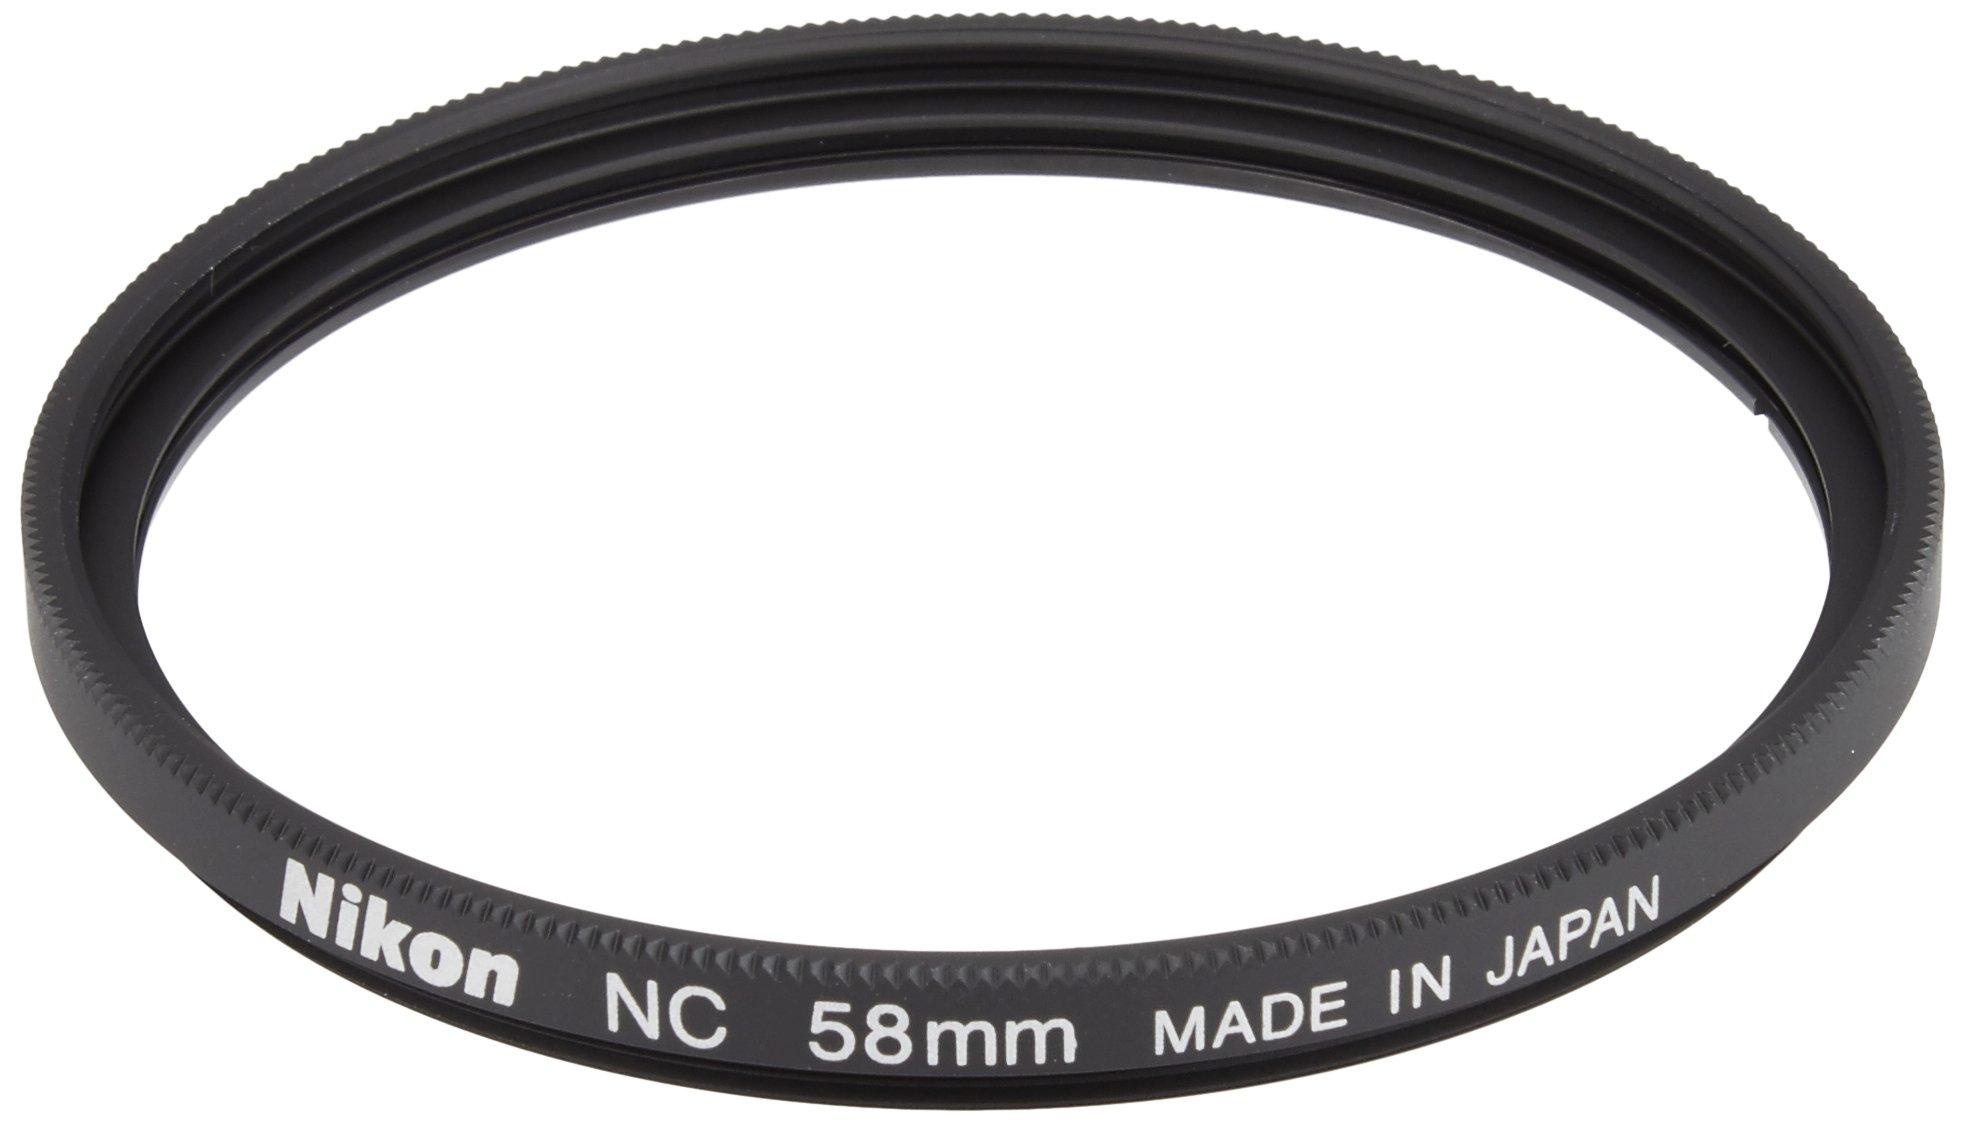 Nikon 2483 58mm NC Filter Attaches to HN-CP17 lens hoodInterchangeable Lens